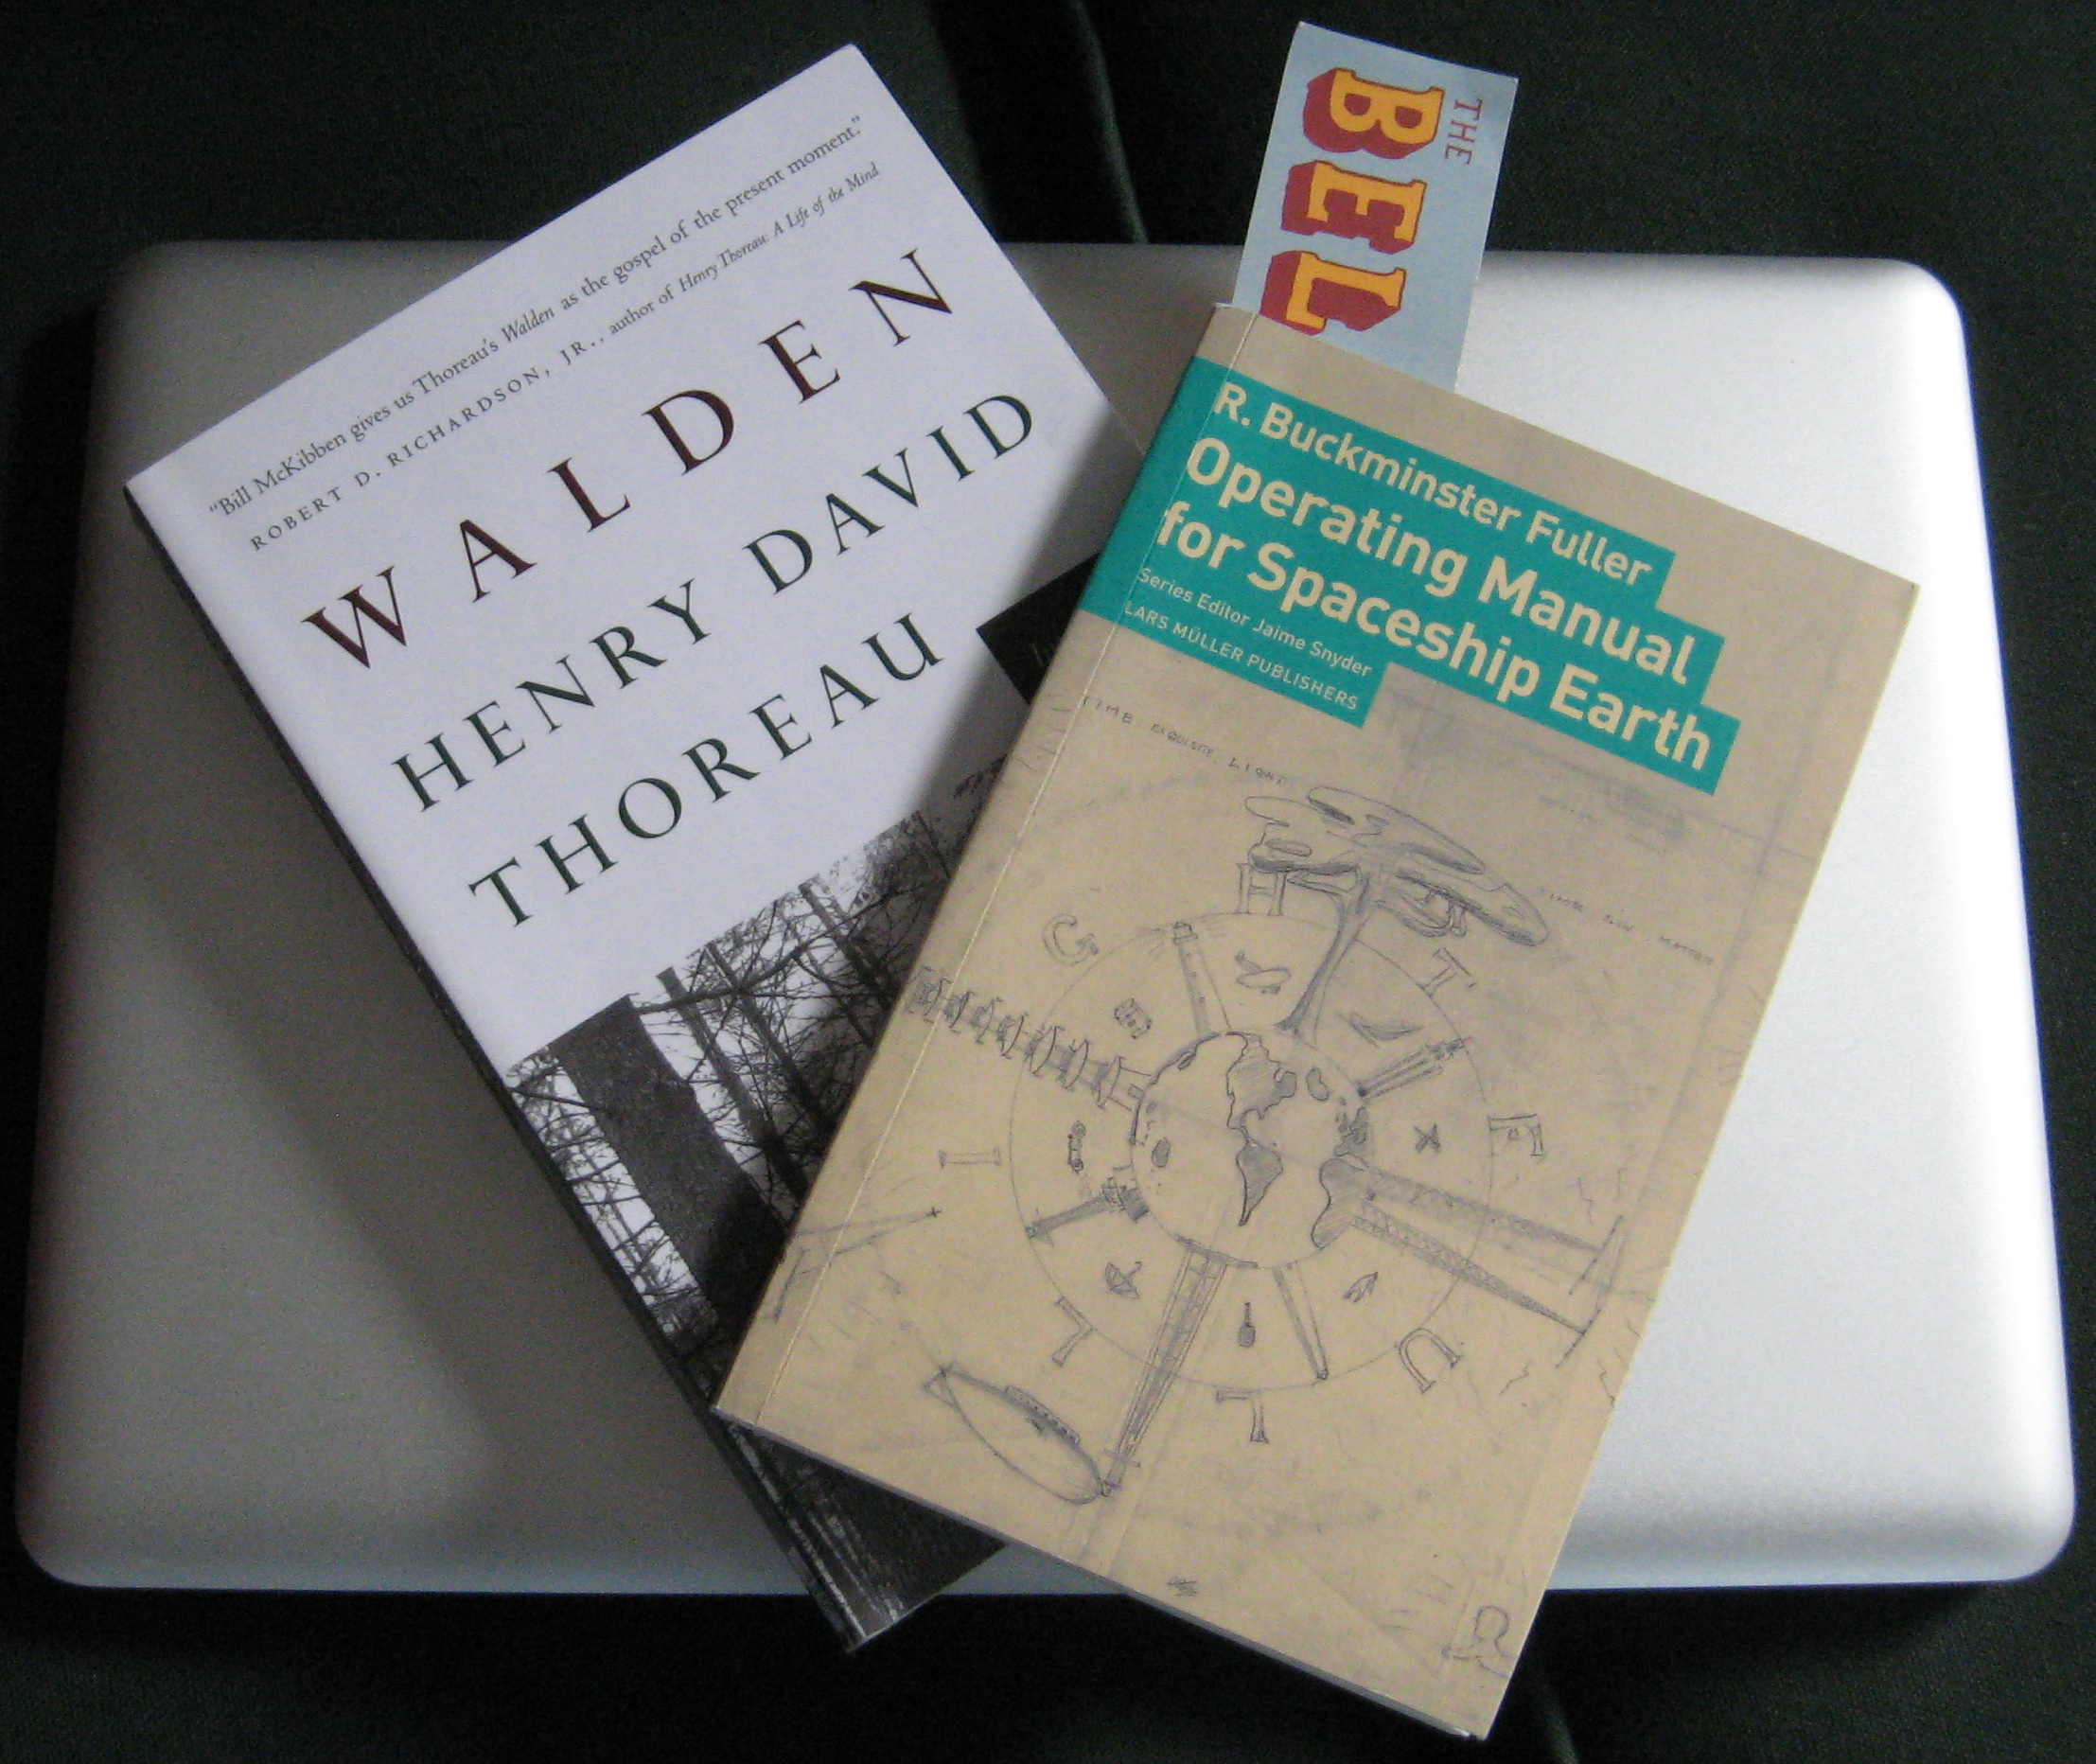 Alternatives to prison essay